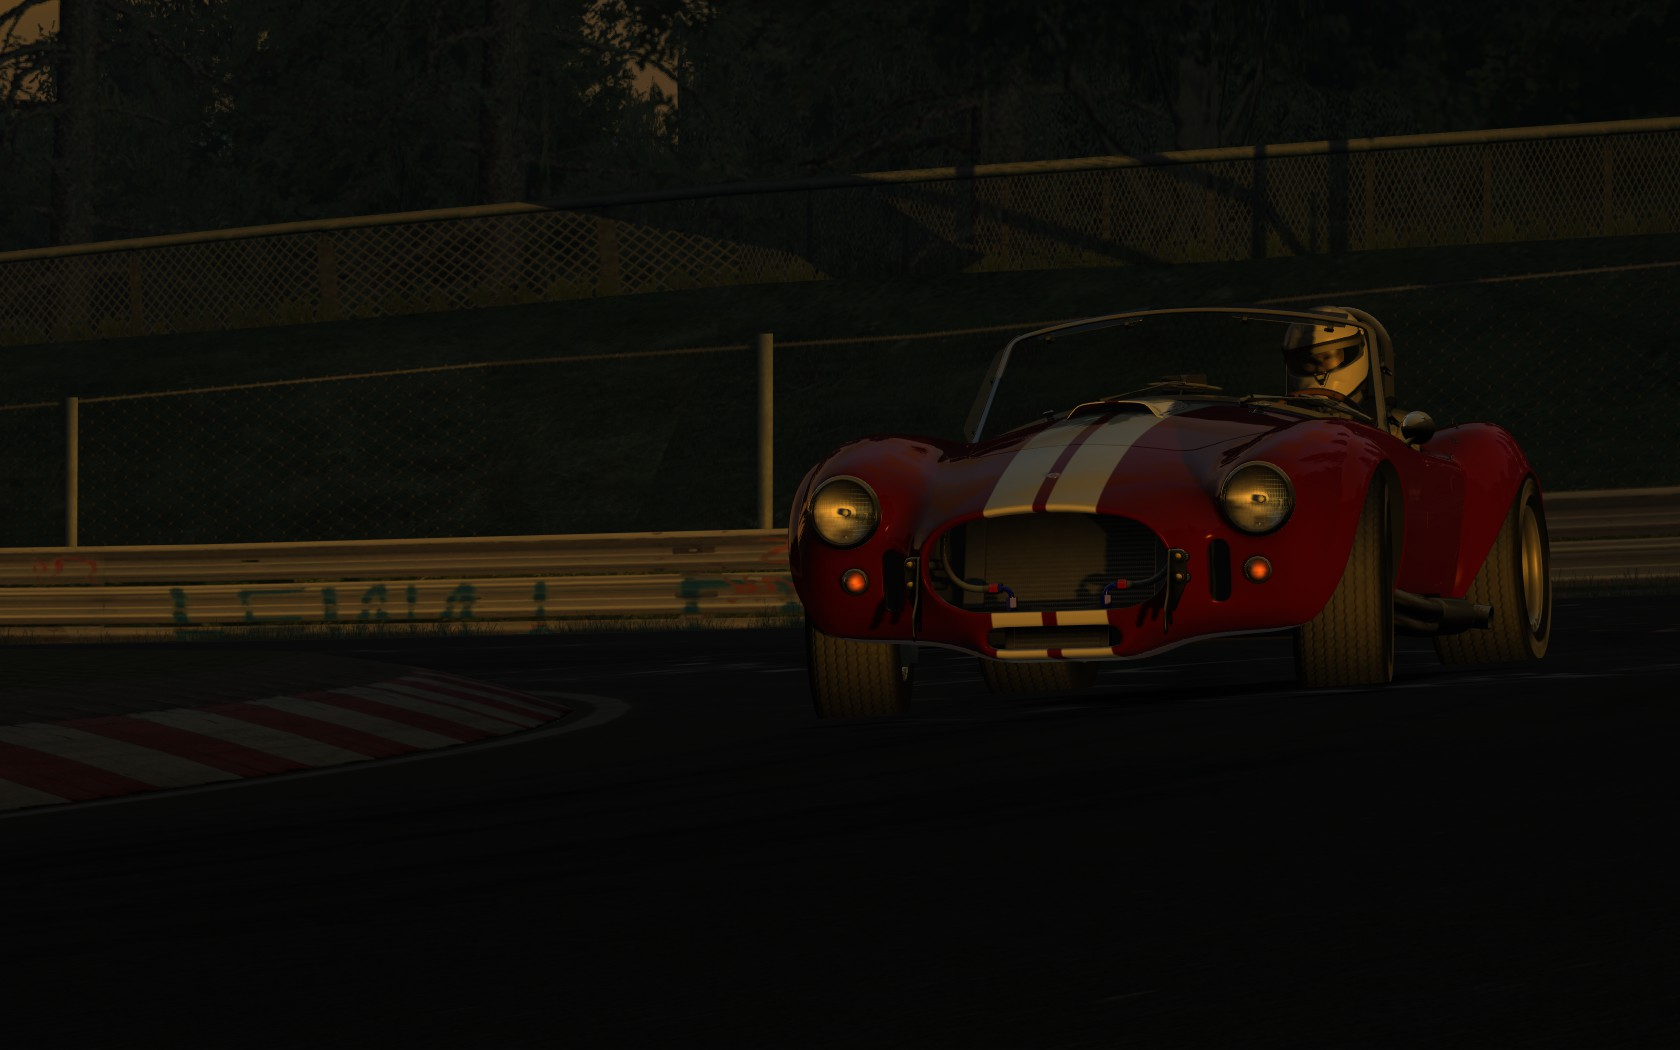 Cobra - Nightschleife